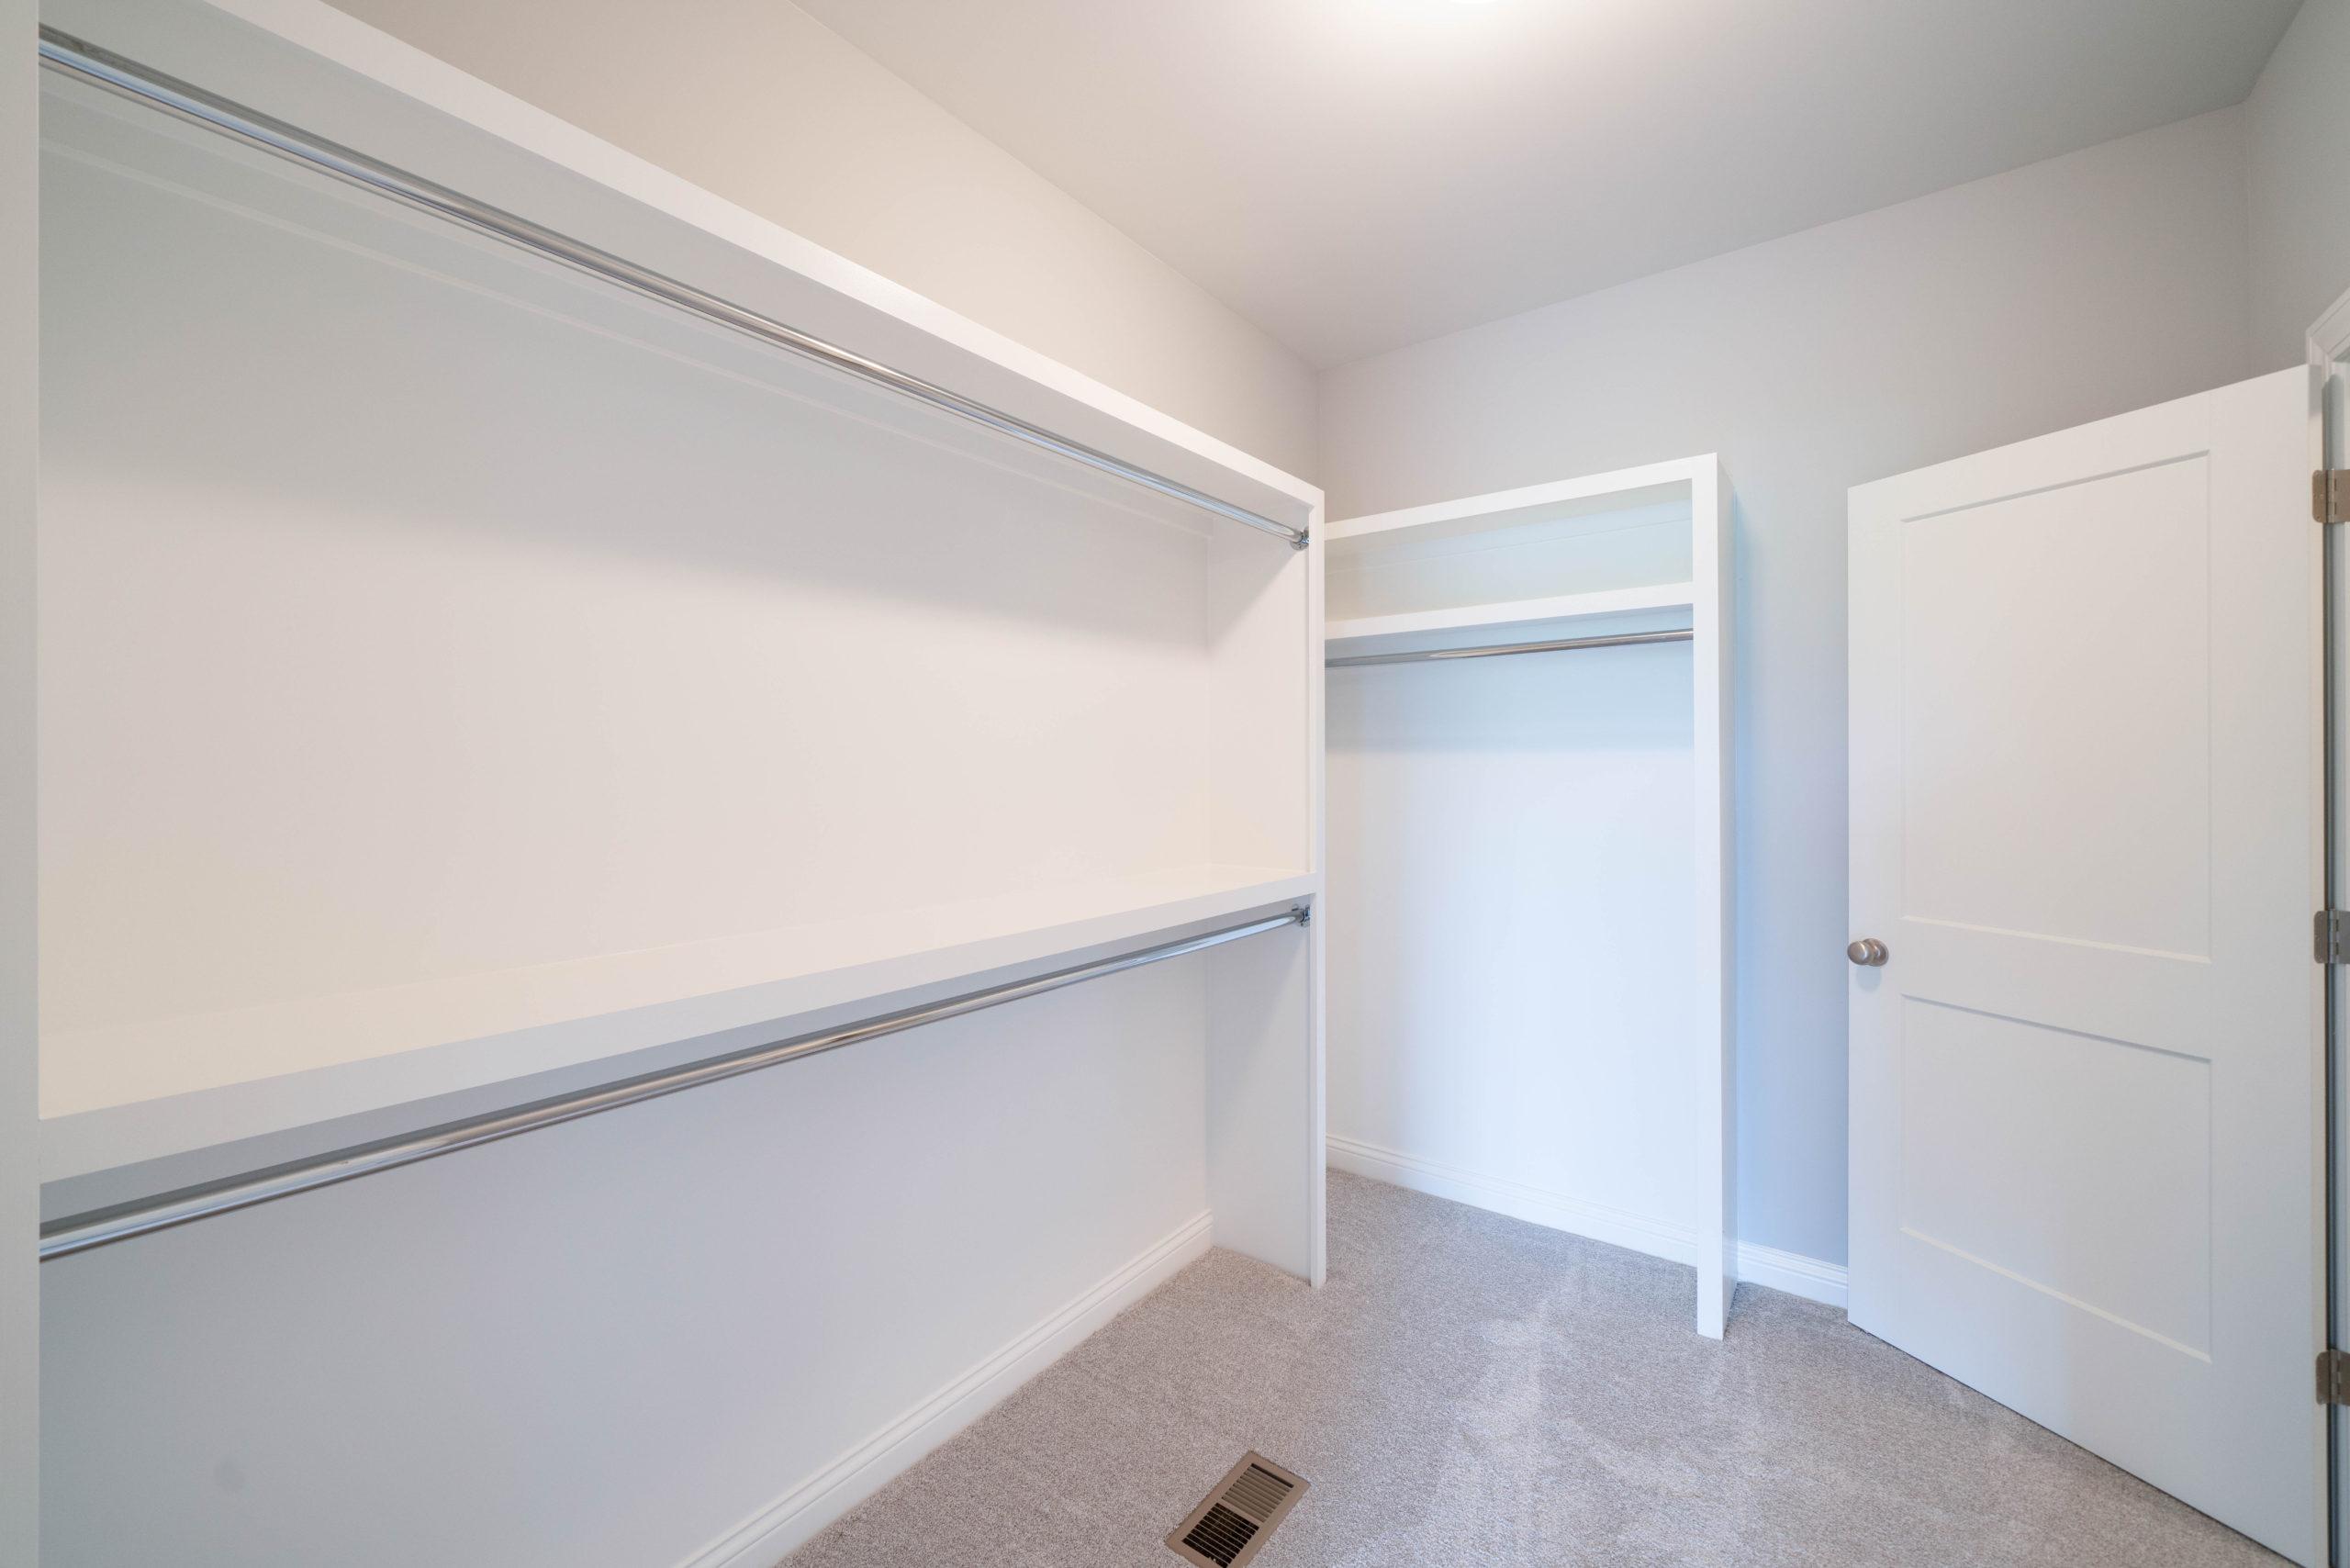 custom walk in closet with white